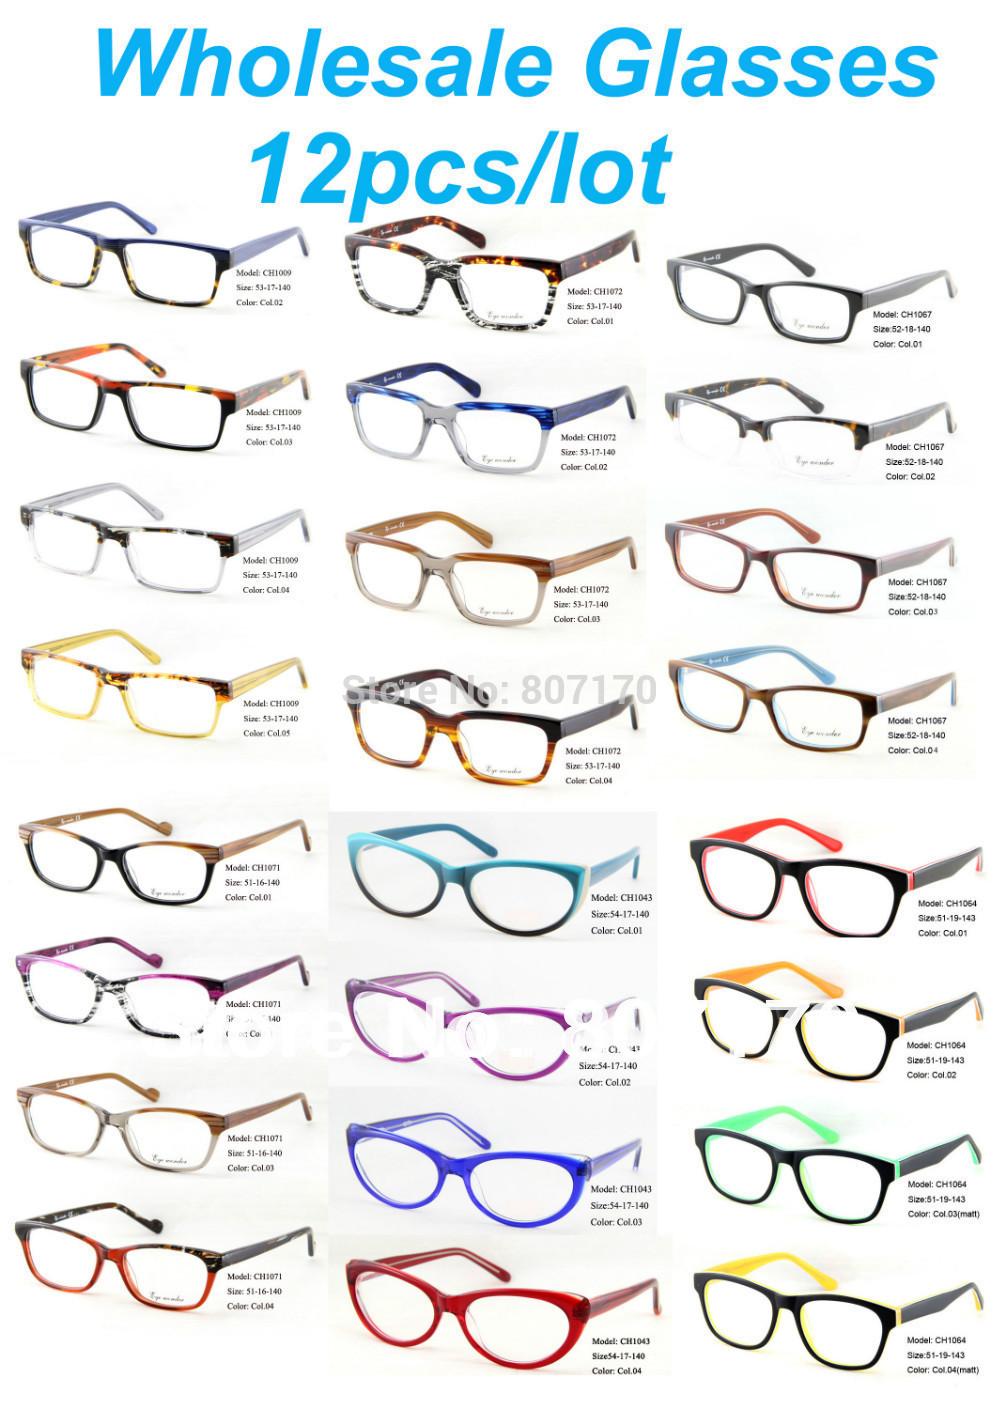 Eyeglasses frames in style - Wholesale Eyewear Accessories Fashion Glasses Frames For Men And Women In Cat Frame Glasses Vingtage Eyeglass Nerd Optical Frame